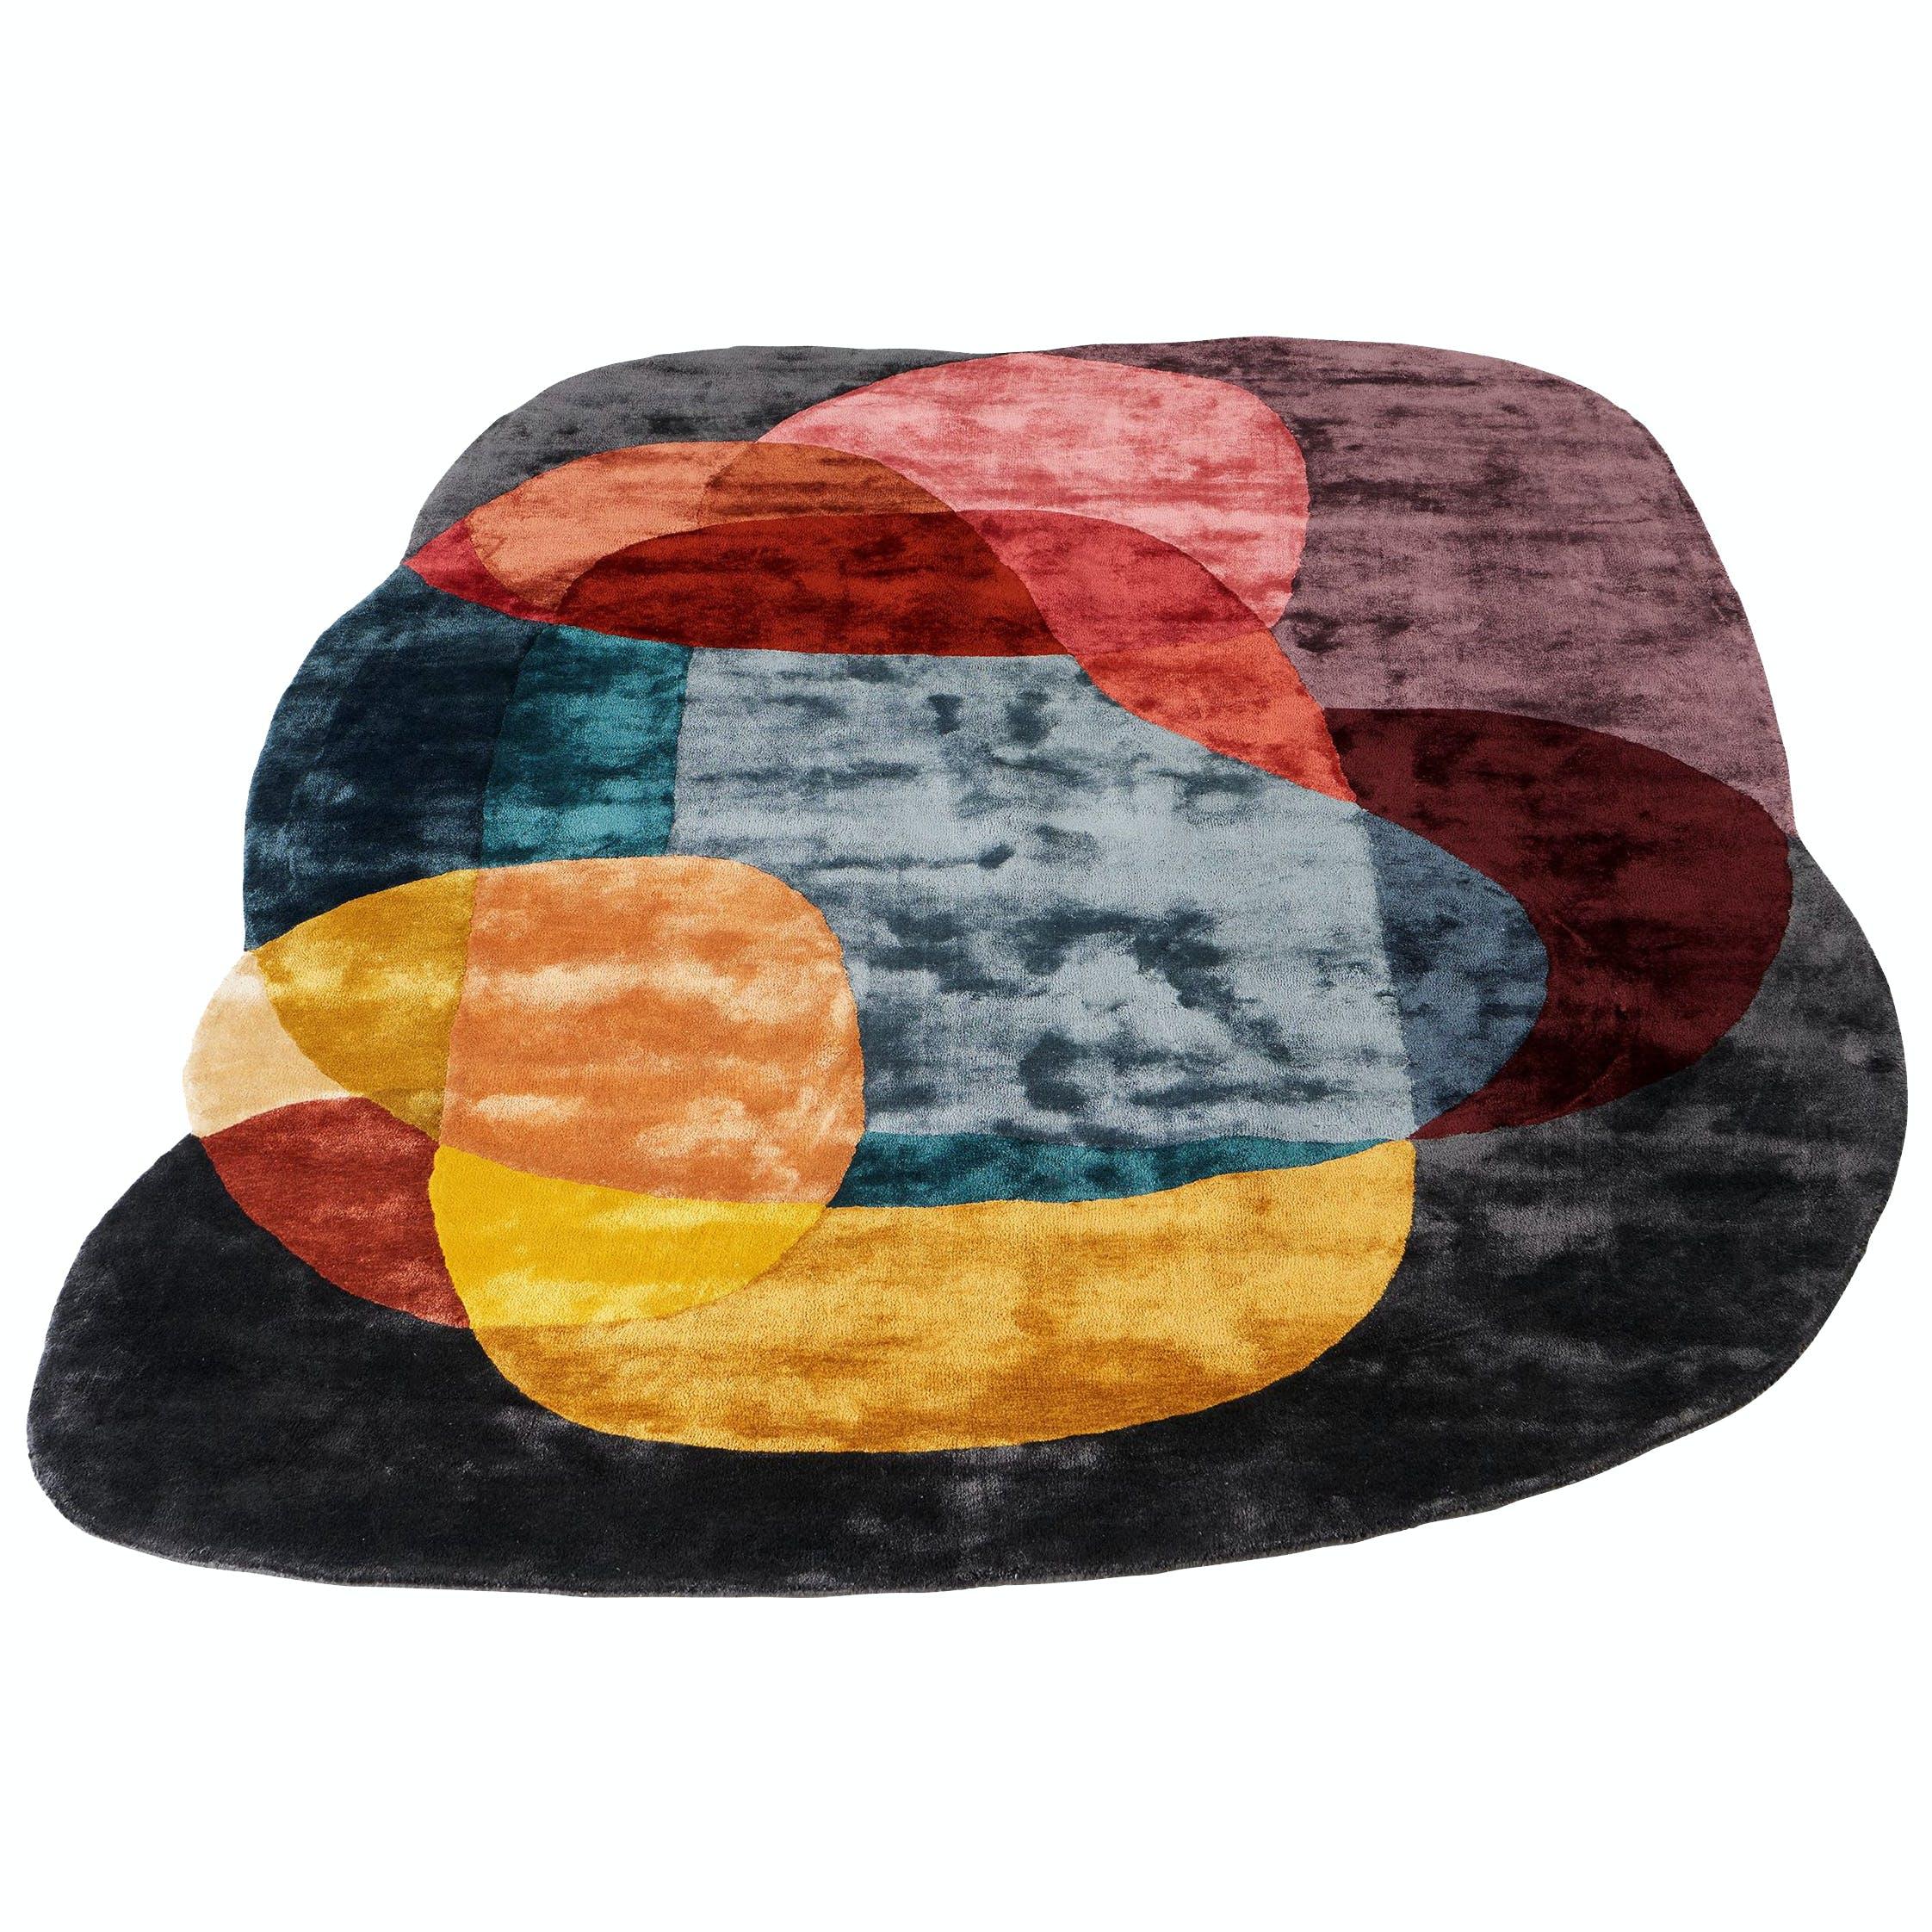 Bolia-art-rug-thumbnail-haute-living